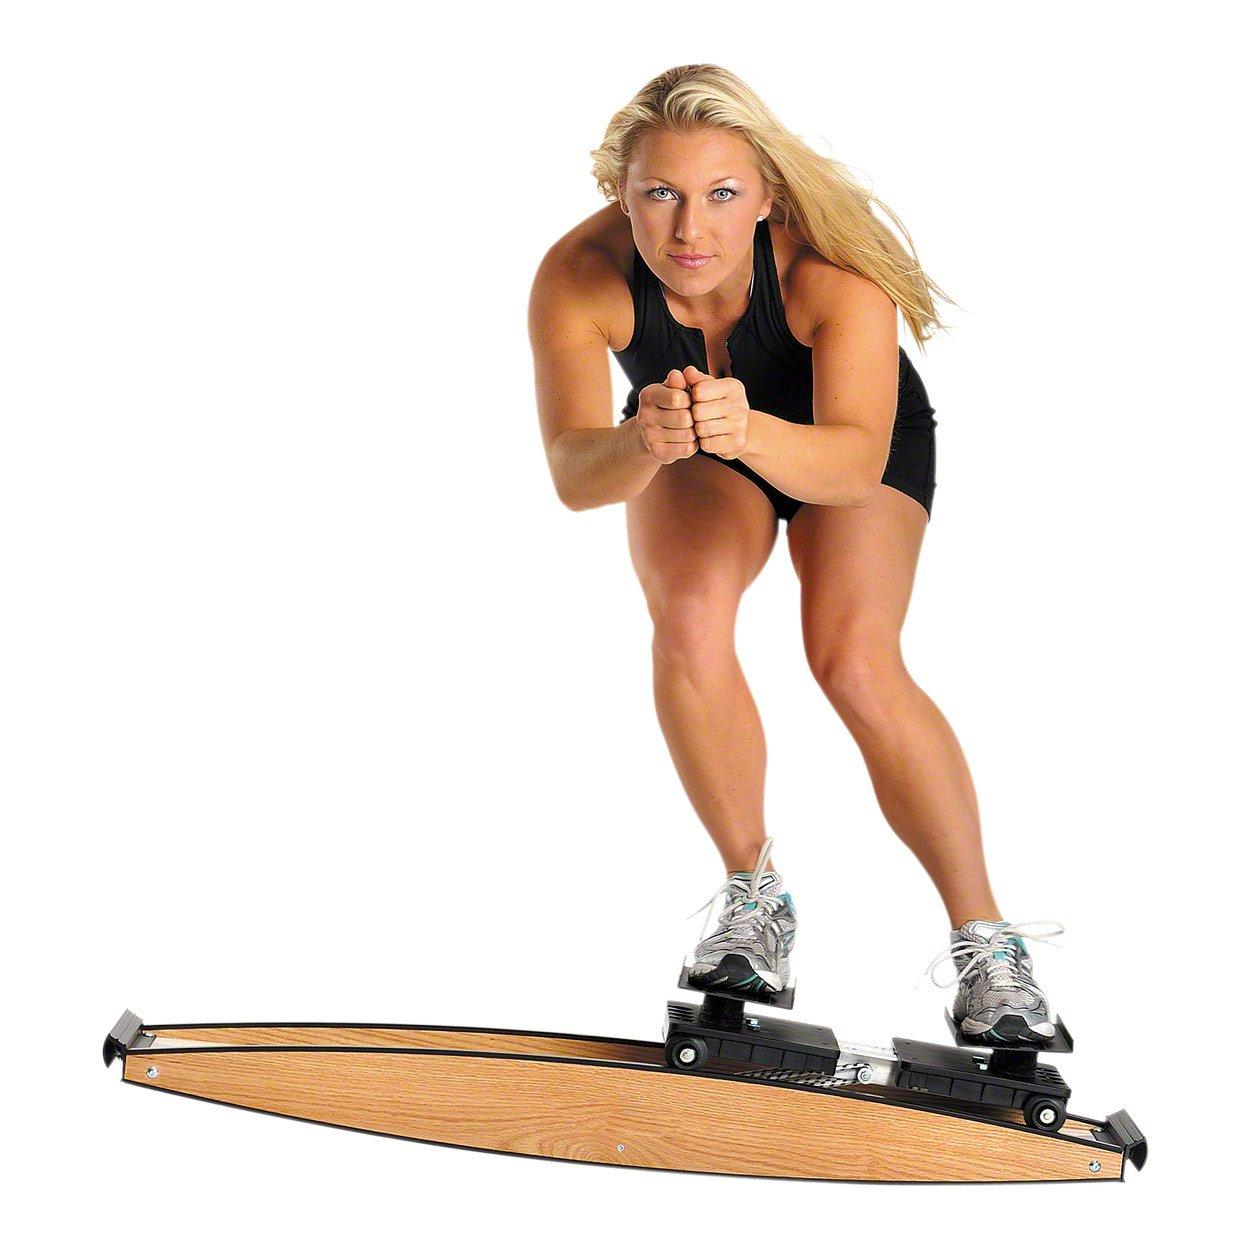 Ski Trainer Pro Fitter 2, Heimtrainer, Ganzkörpertrainer, 3D Crosstrainer Sport-Tec